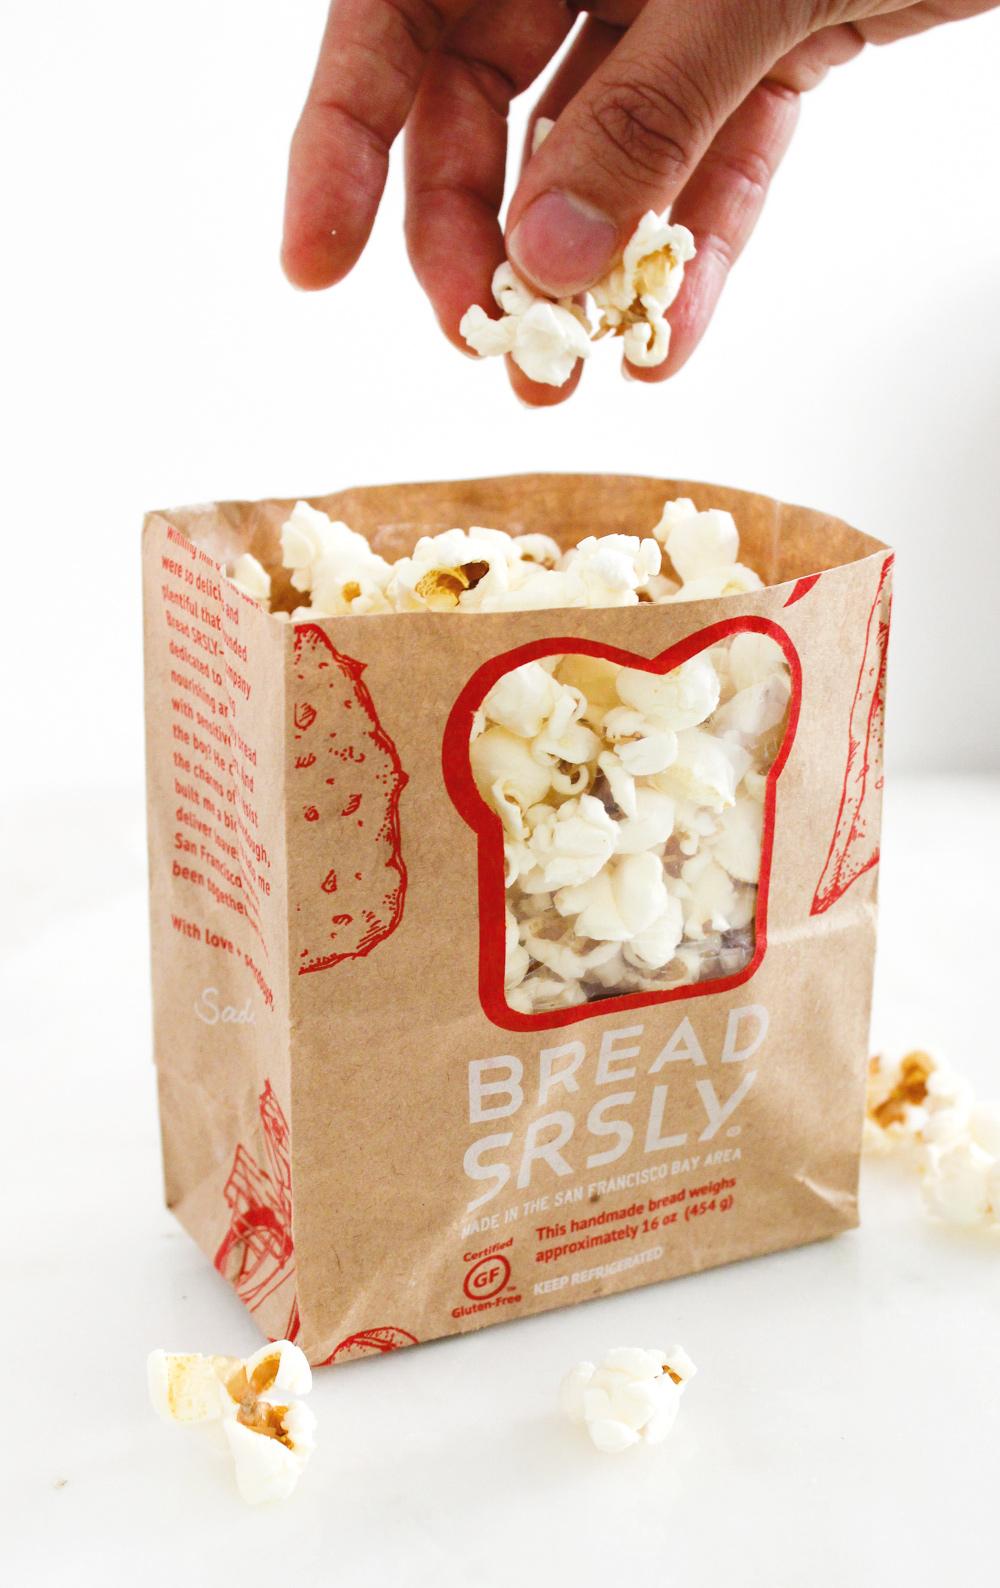 reuse-your-bread-srsly-bag-for-popcorn-snacks.jpg